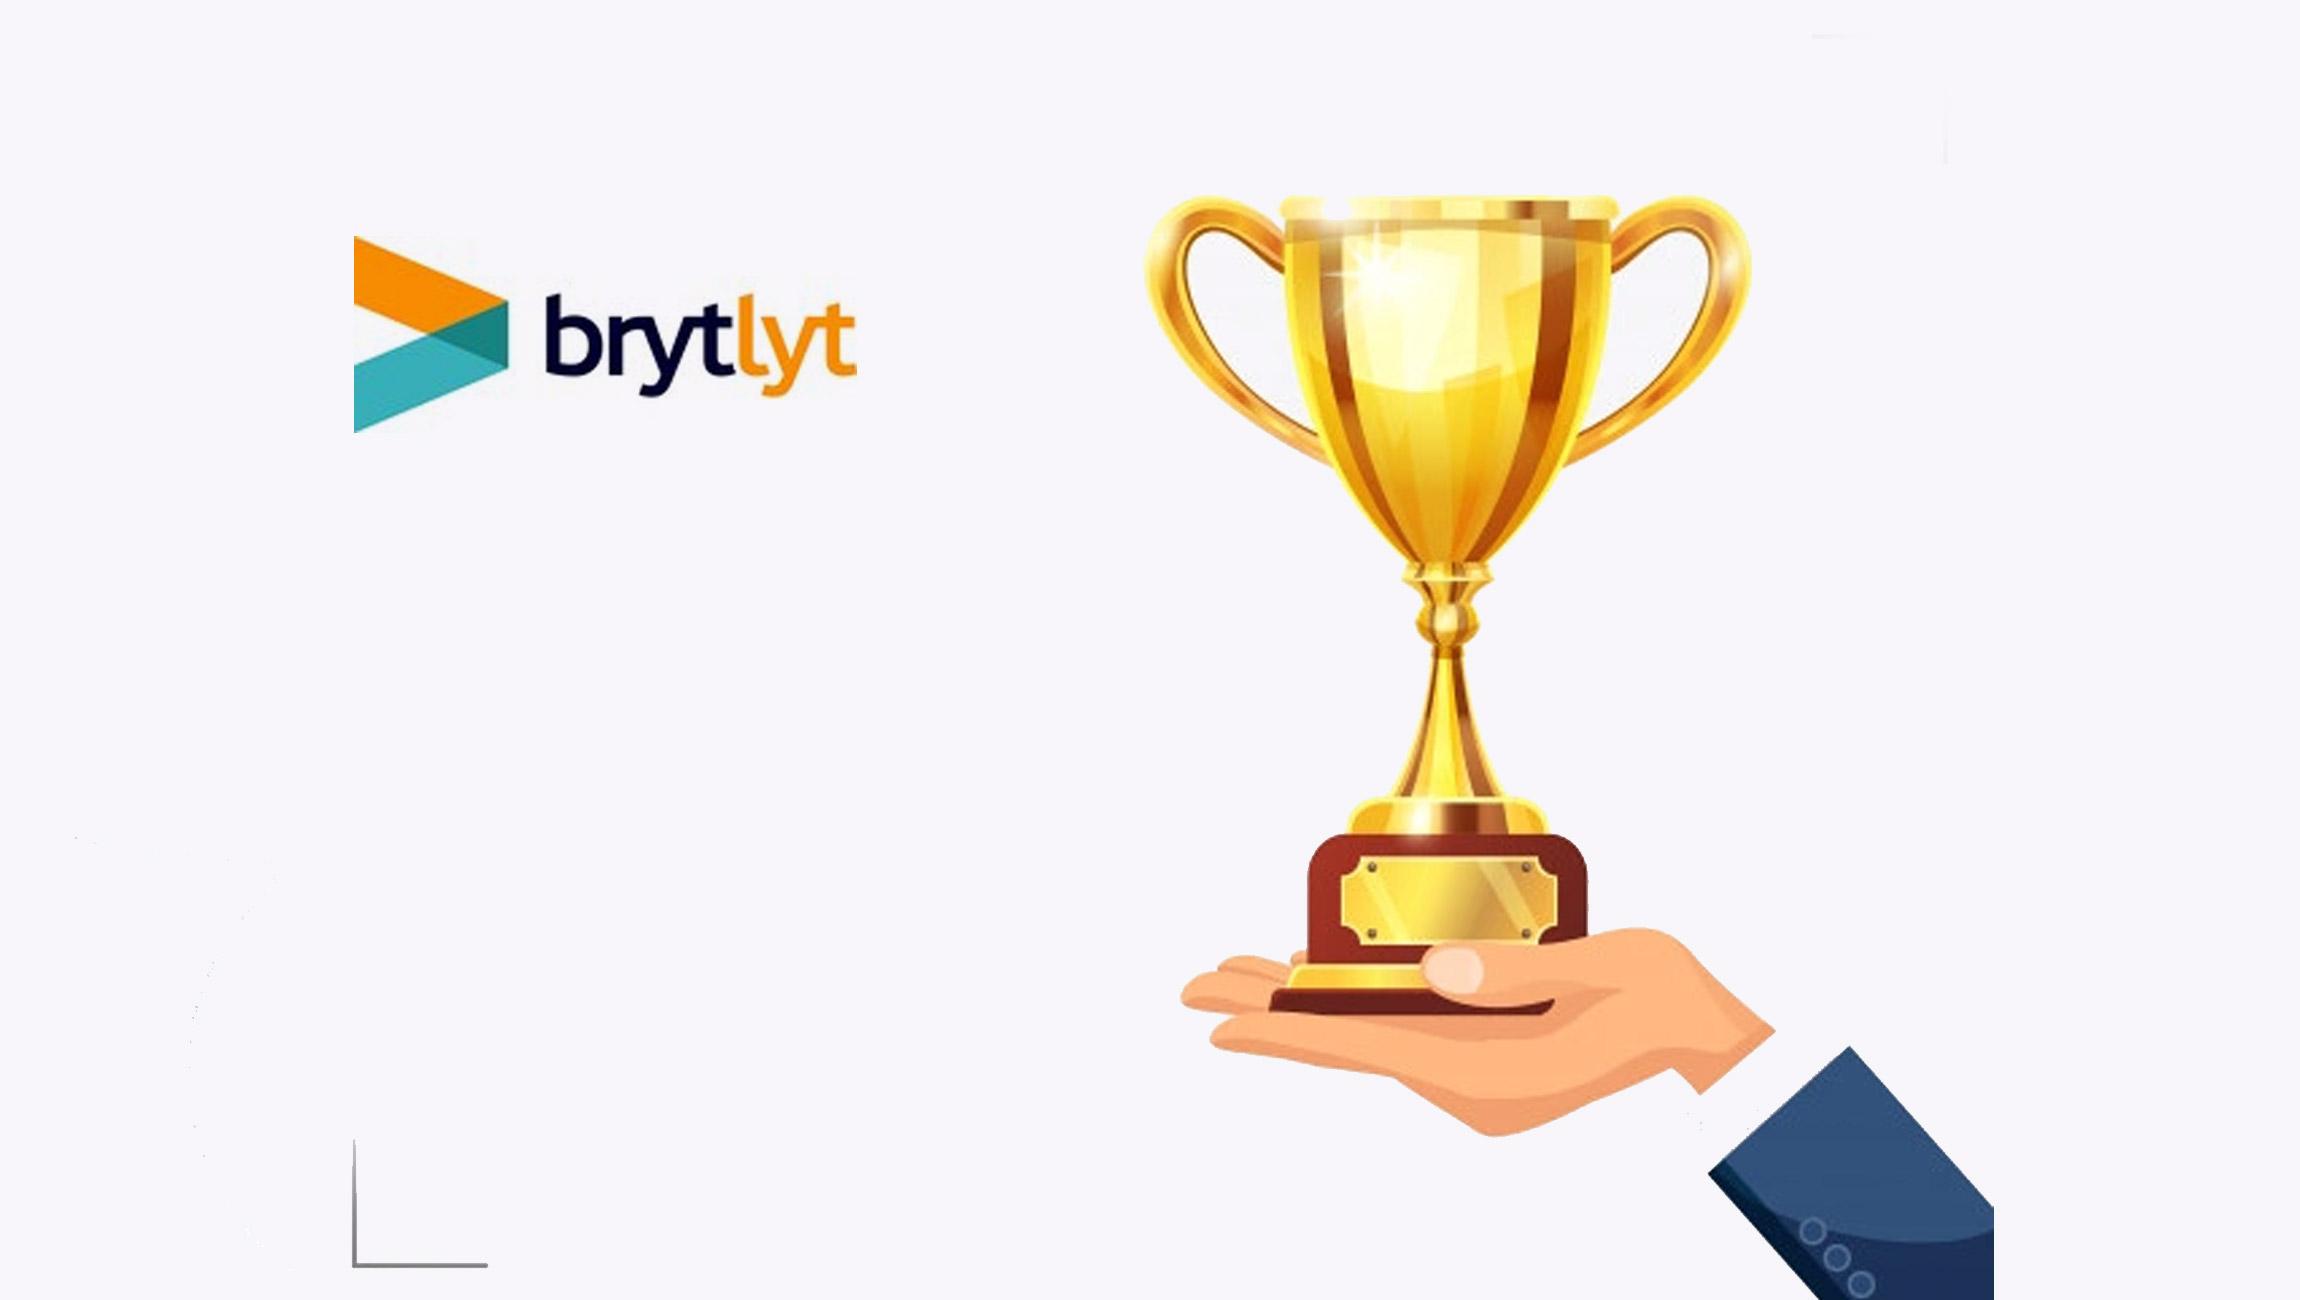 Brytlyt-Awarded-U.S.-Patent-for-Relational-JOINs-Algorithm